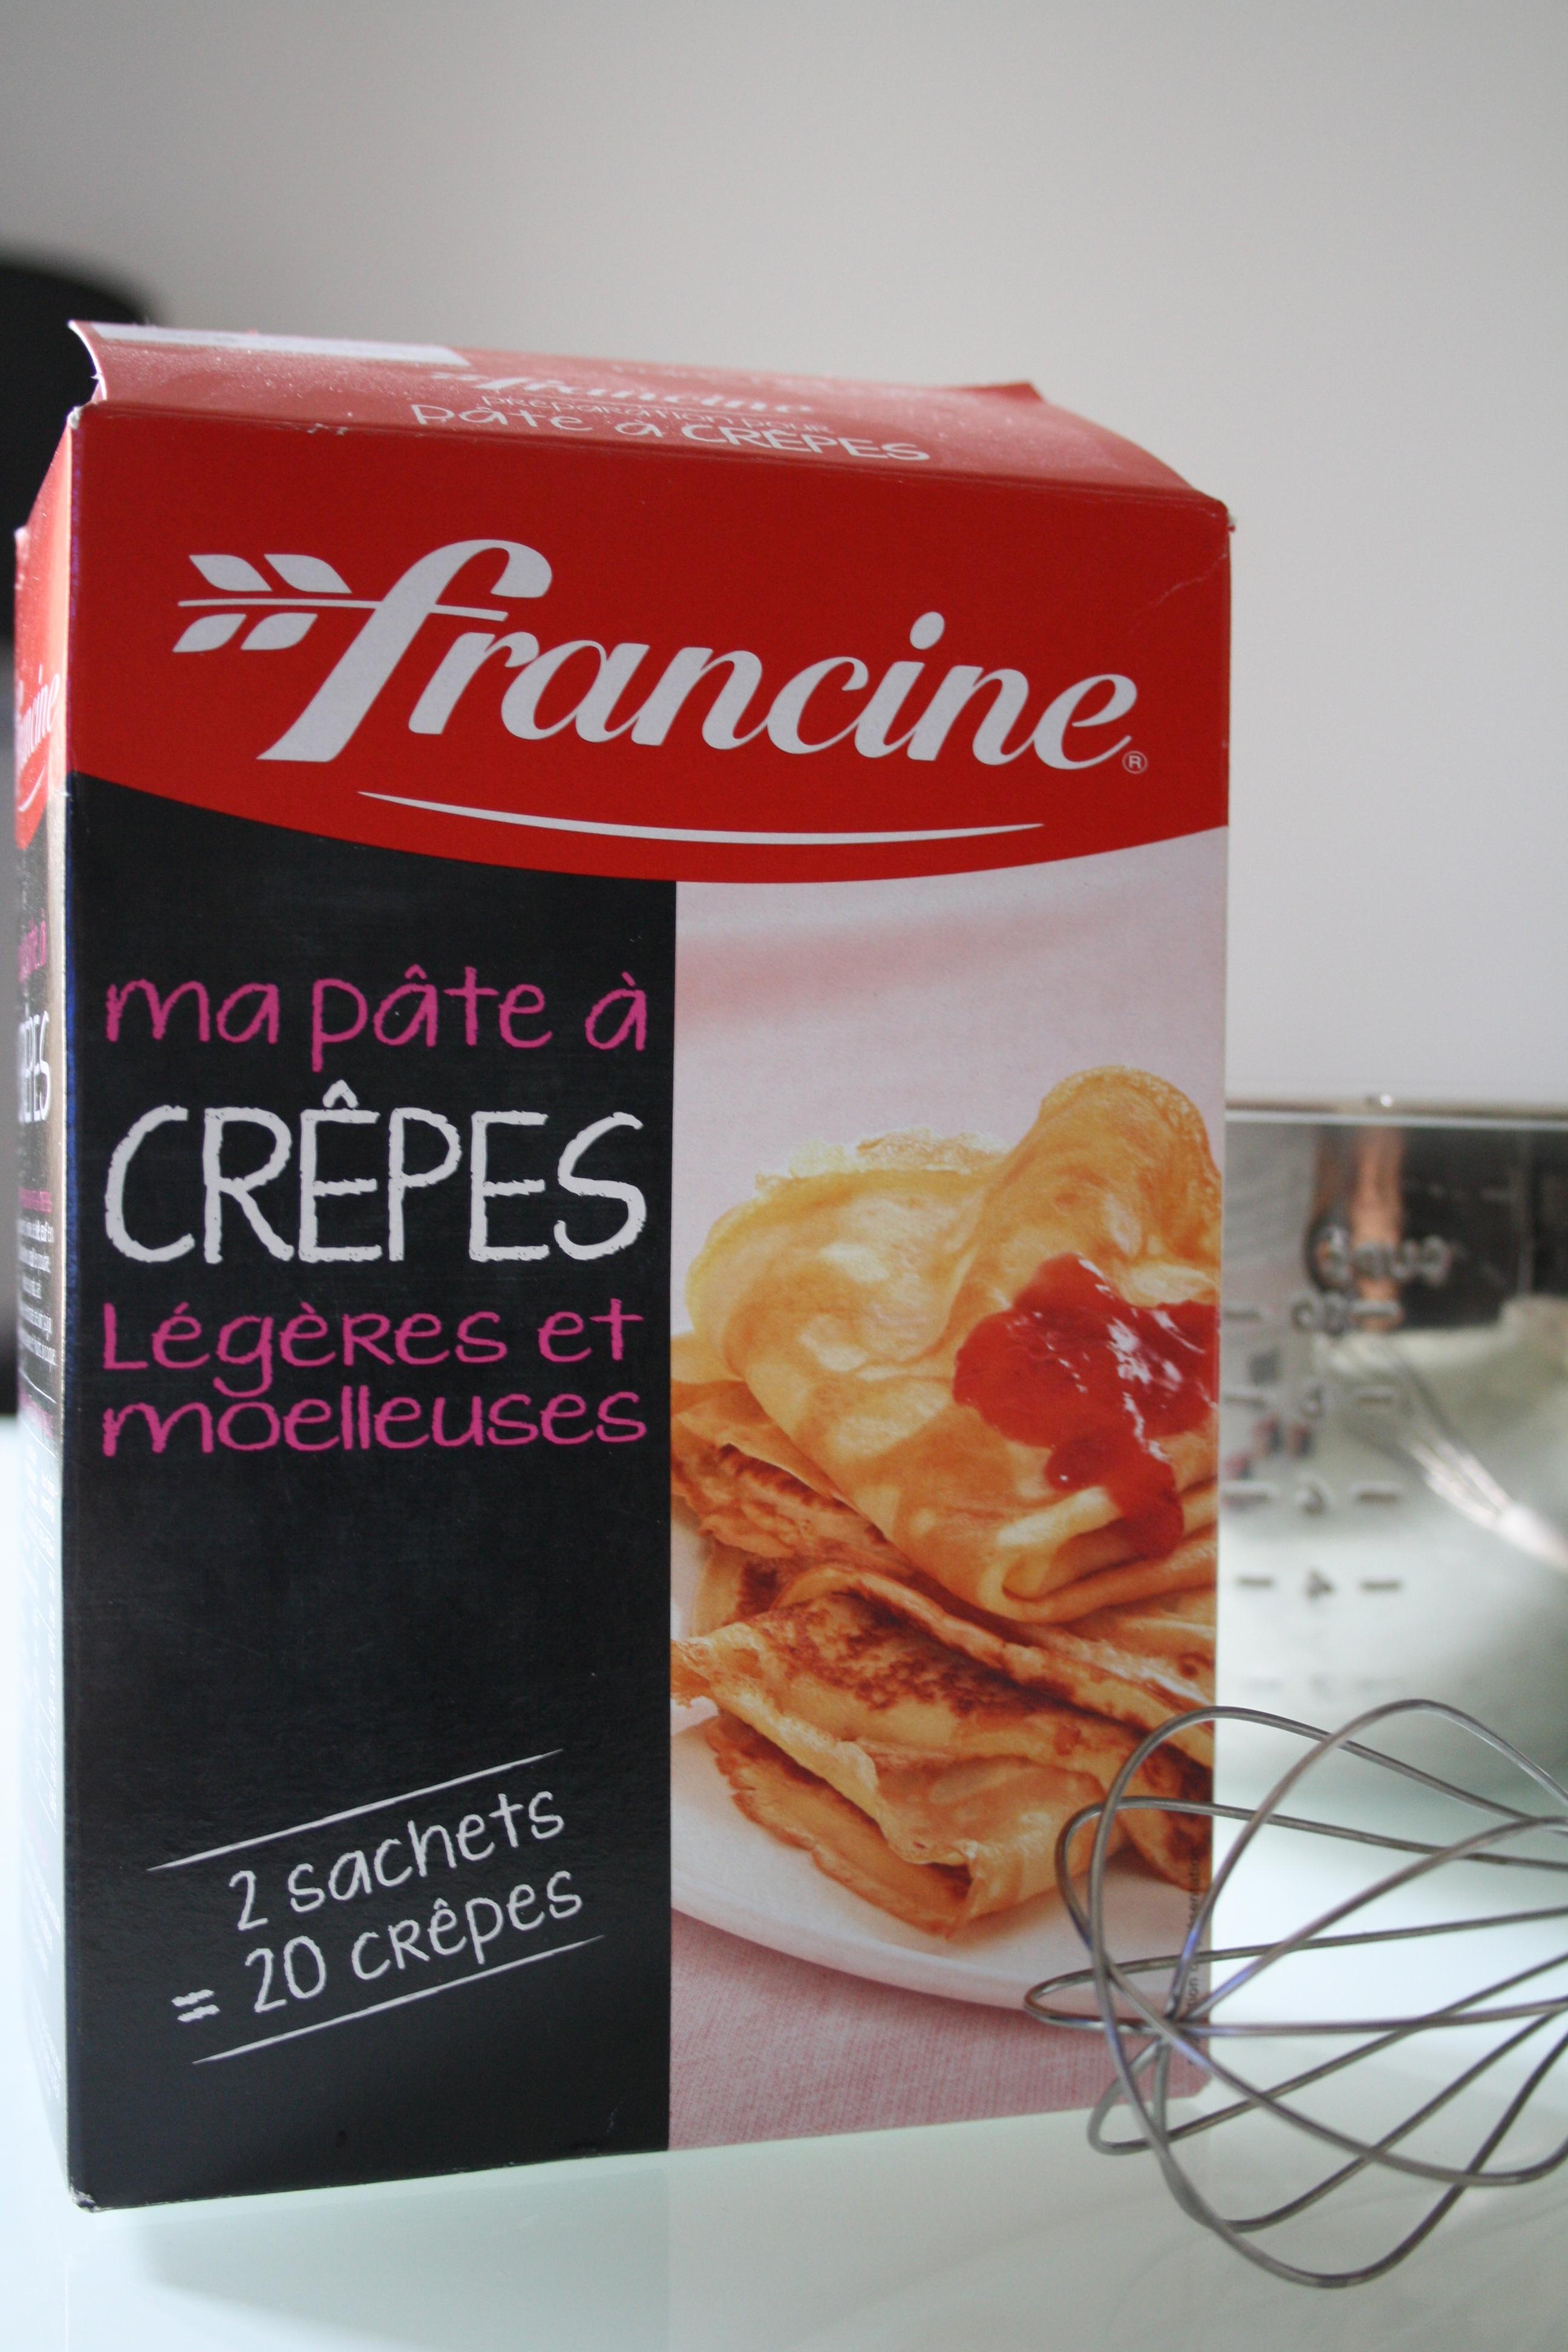 Crêpes Francine - Mathilde et Gourmandises